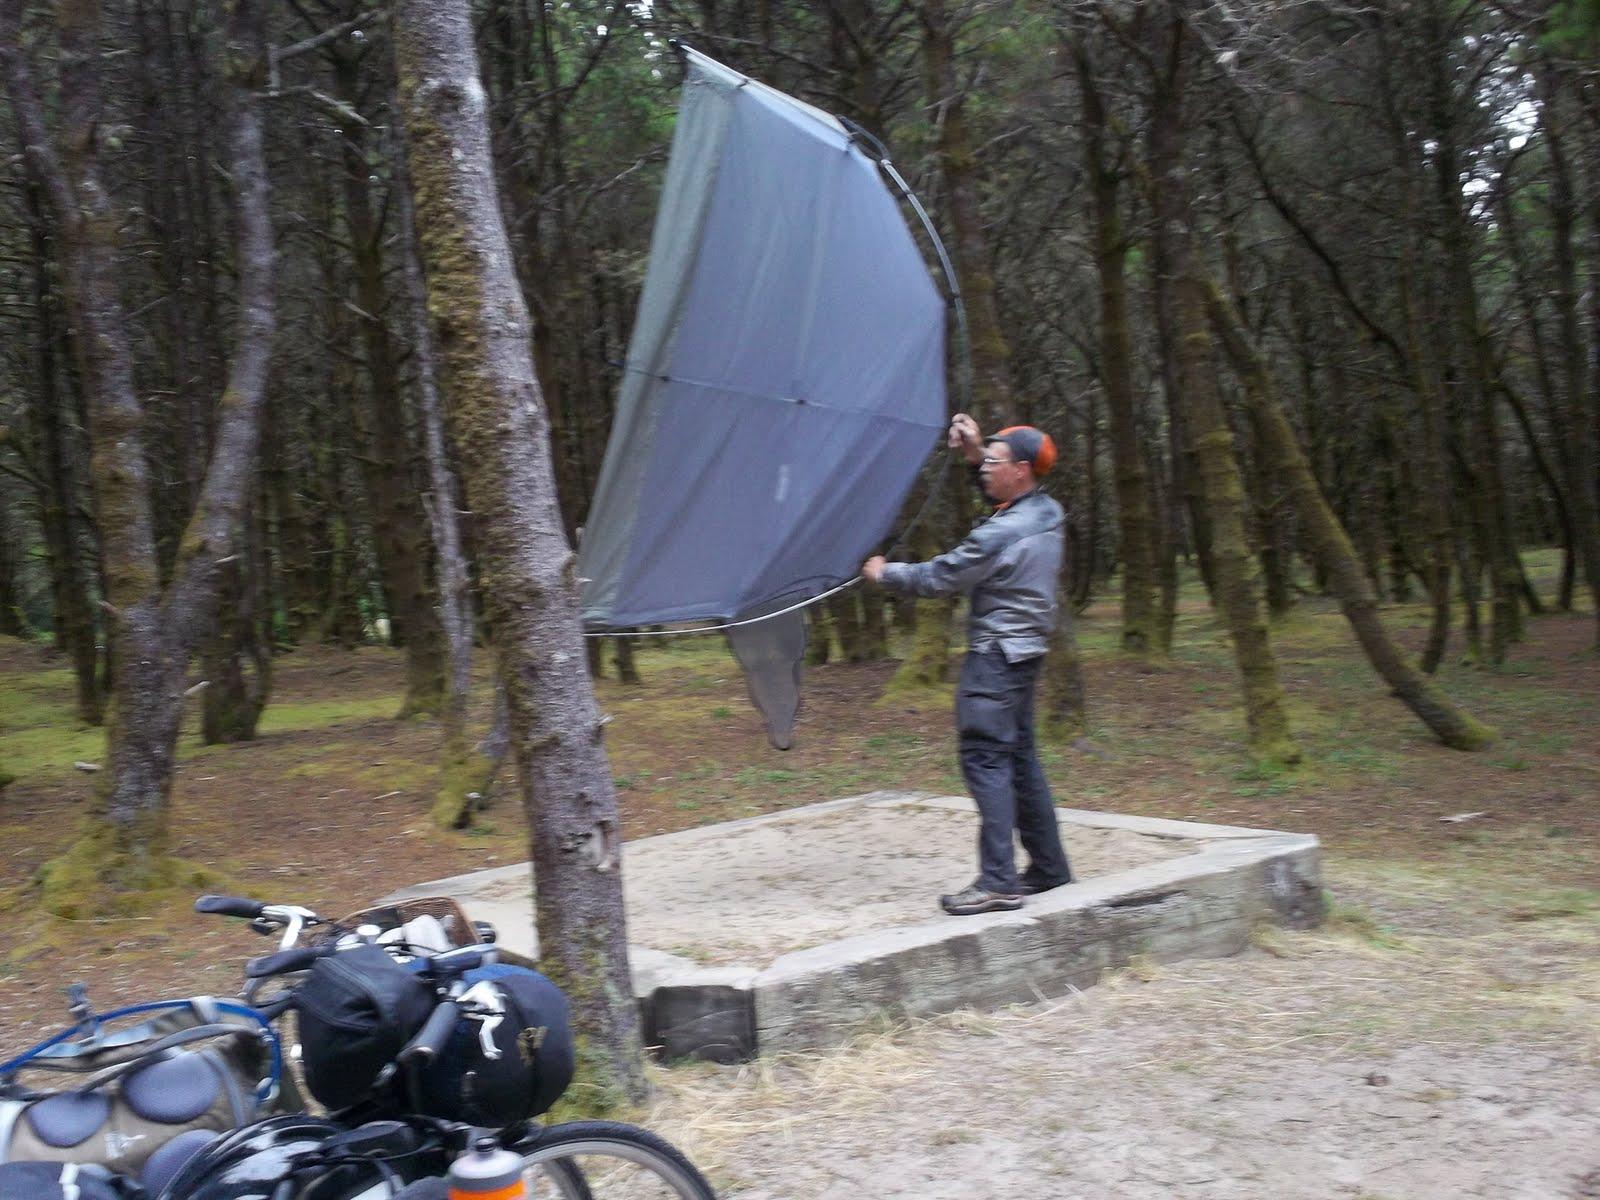 & Kentu0027s Bike Blog: Big Agnes Seedhouse SL-2: A Good Tent for Bike Touring